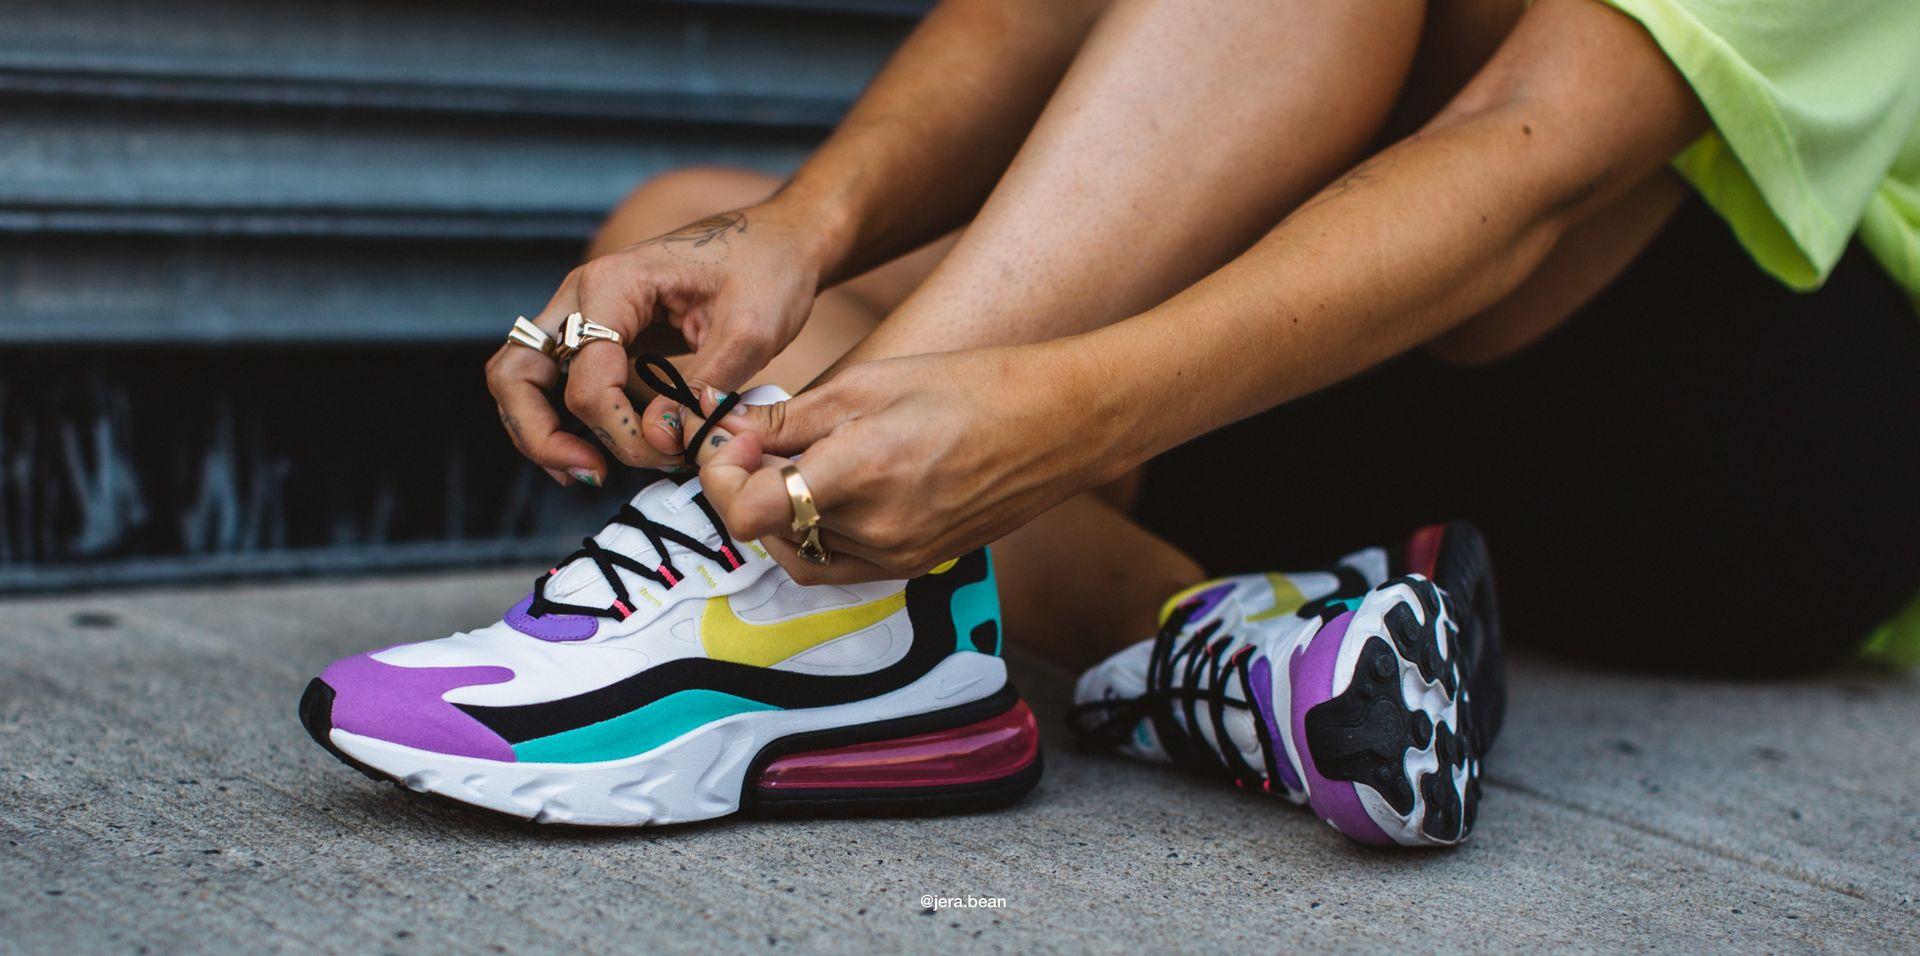 87ee5b086aae8 Nike Women's Shoes, Clothing and Gear. Nike.com